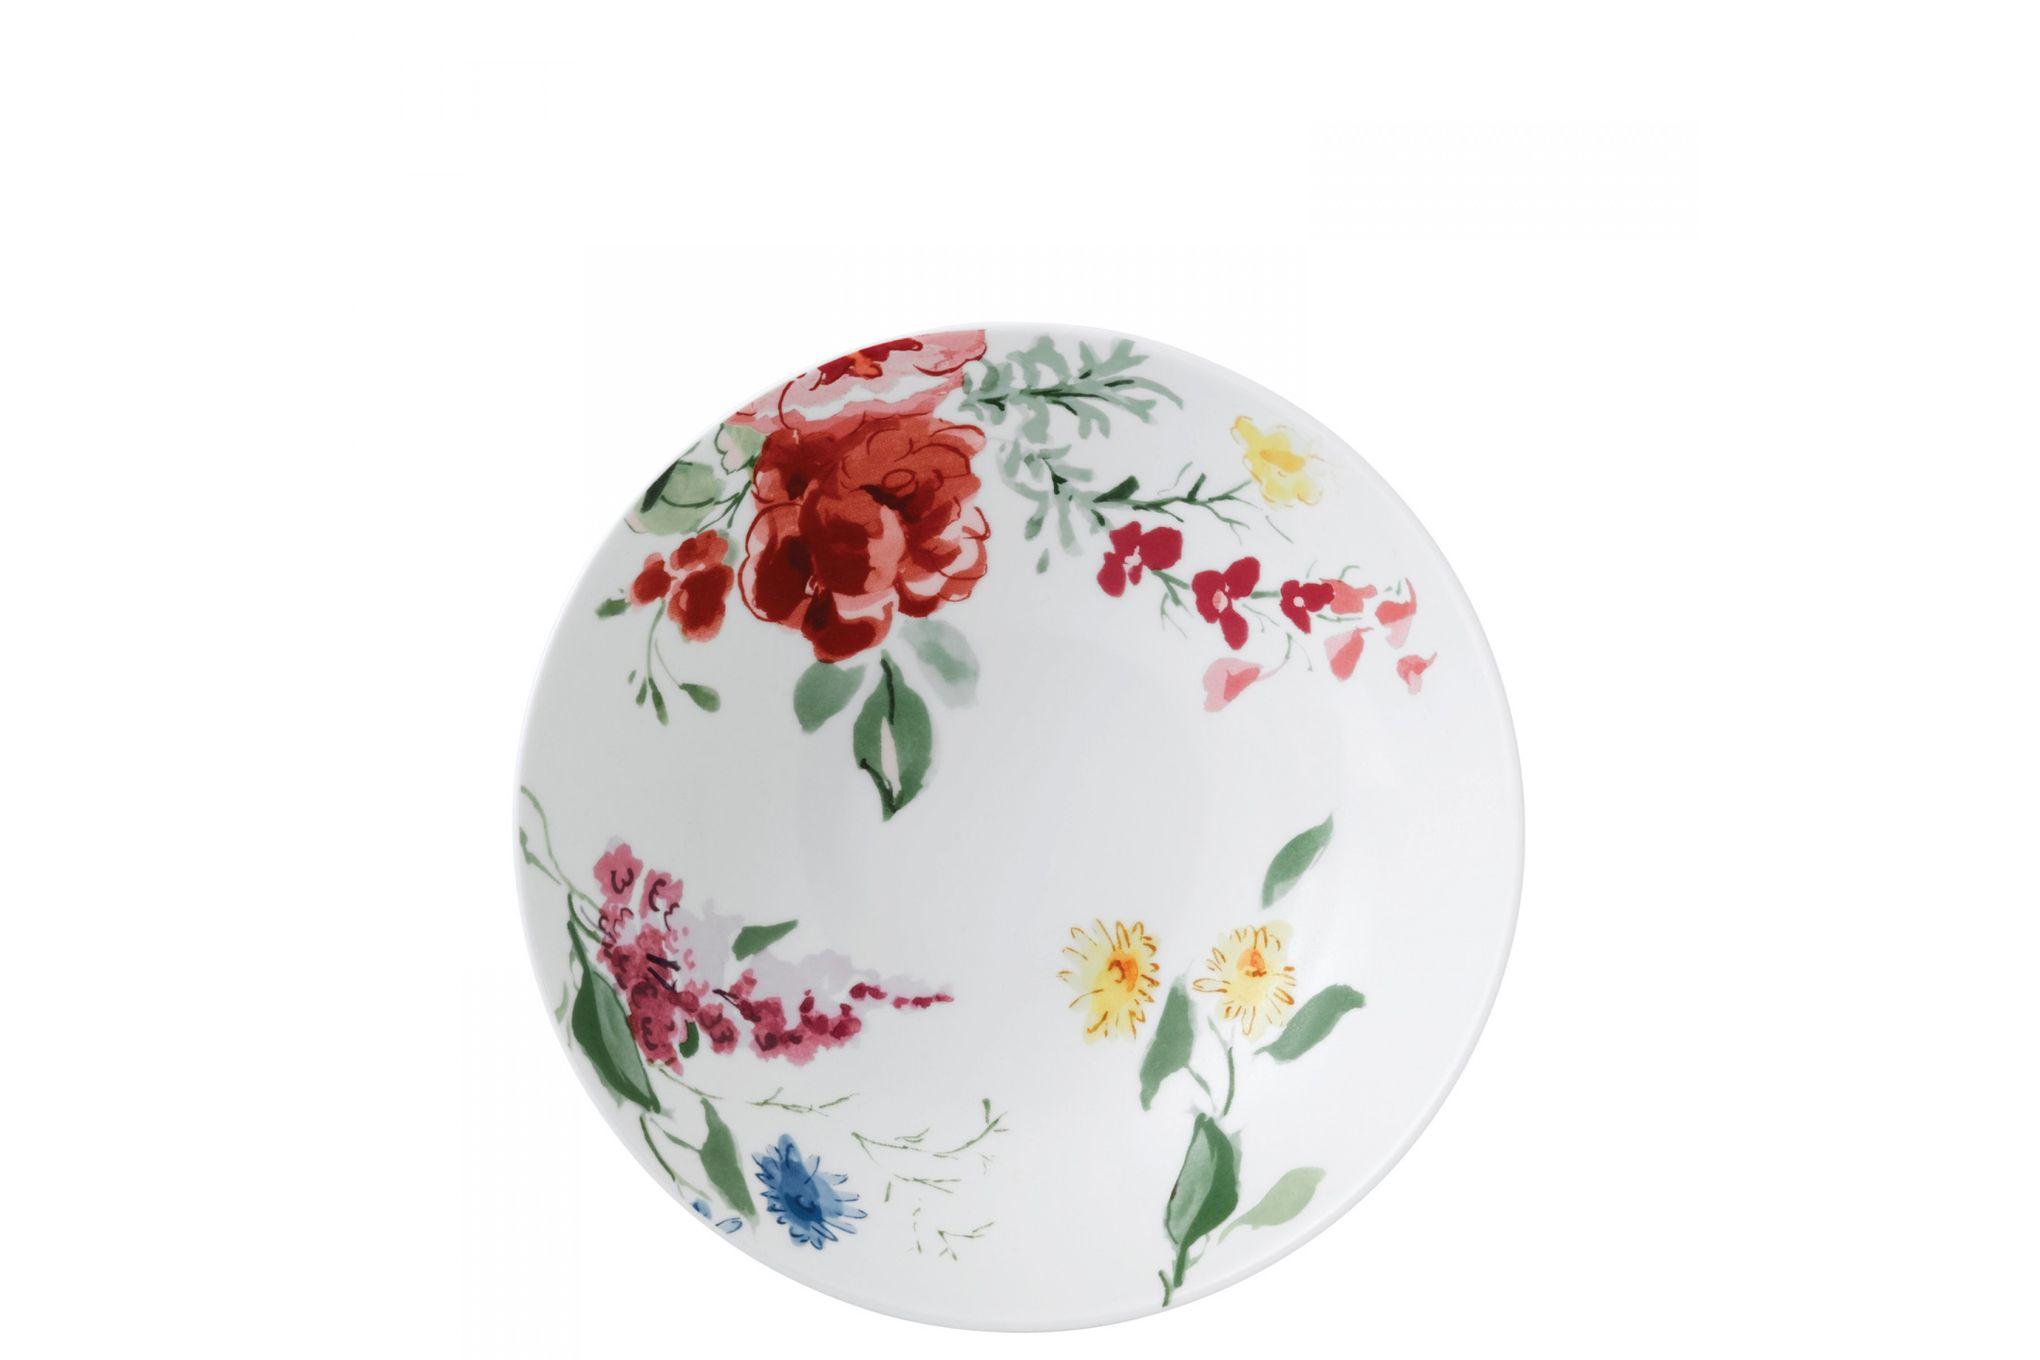 Jasper Conran for Wedgwood Floral Bowl 22cm thumb 2